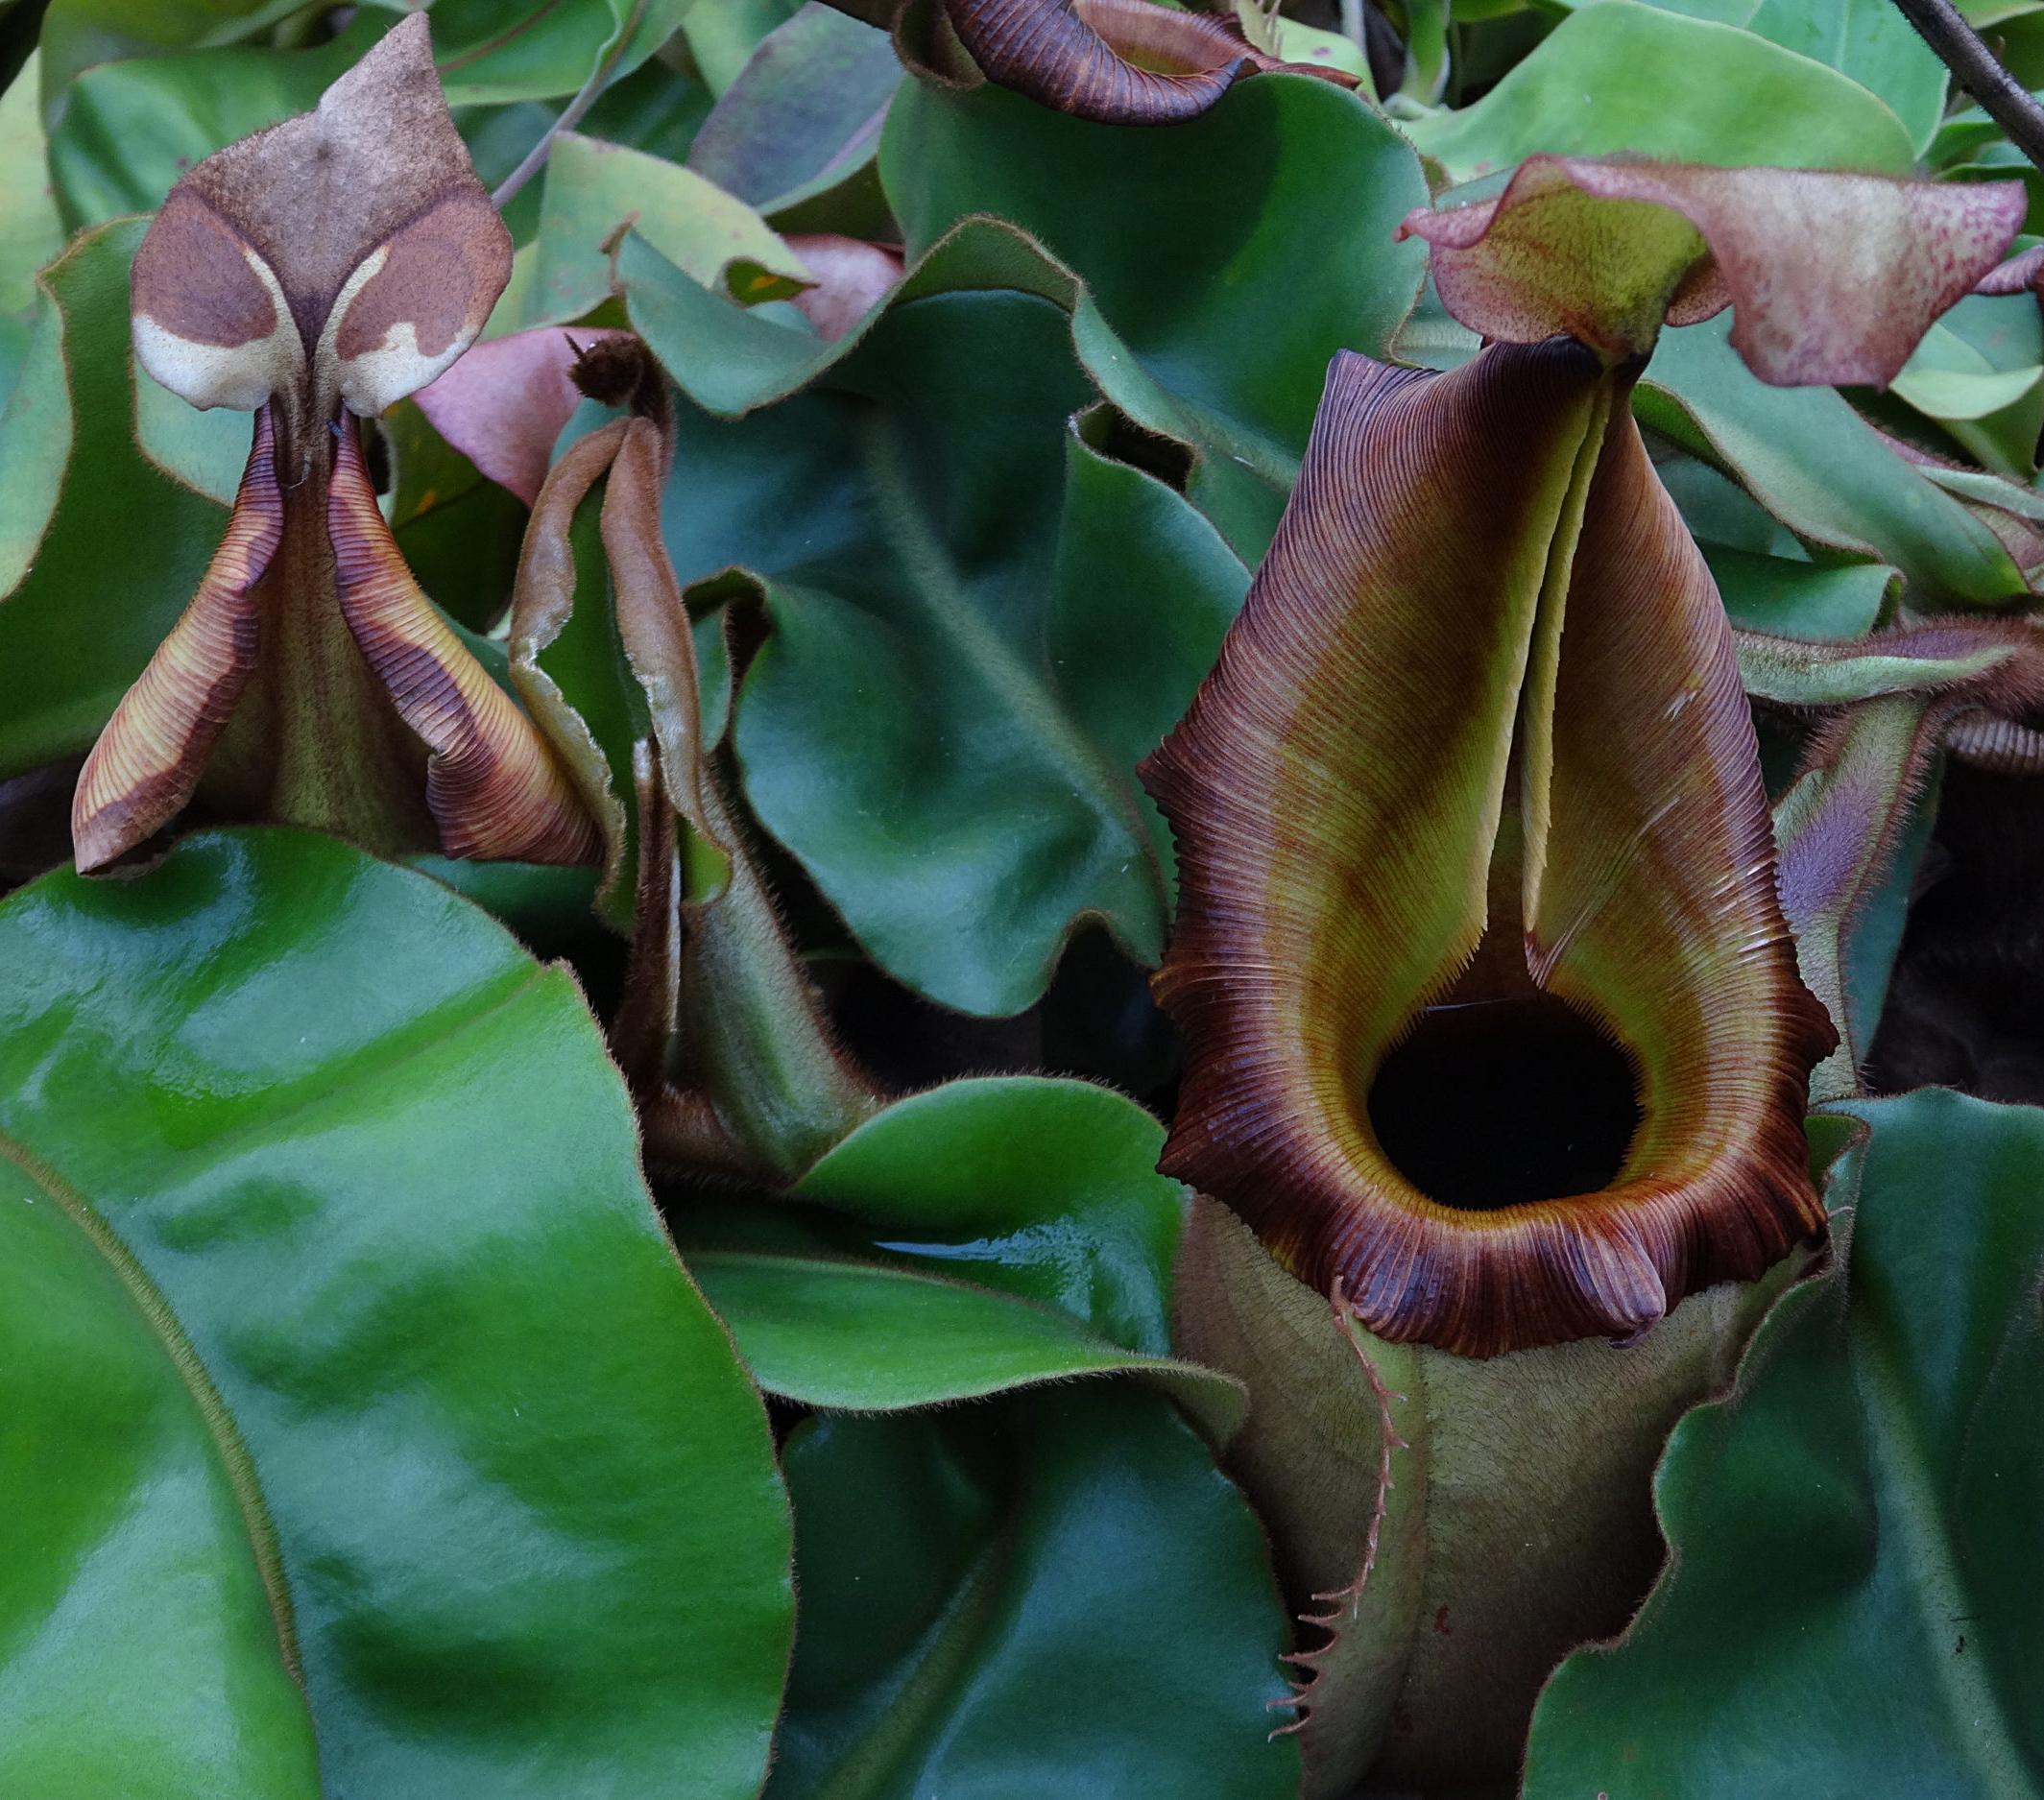 Nepenthes veitchii Bario, Sarawak ecotype, normal peristome form. Grown by Josh Brown of Predatory Plants.